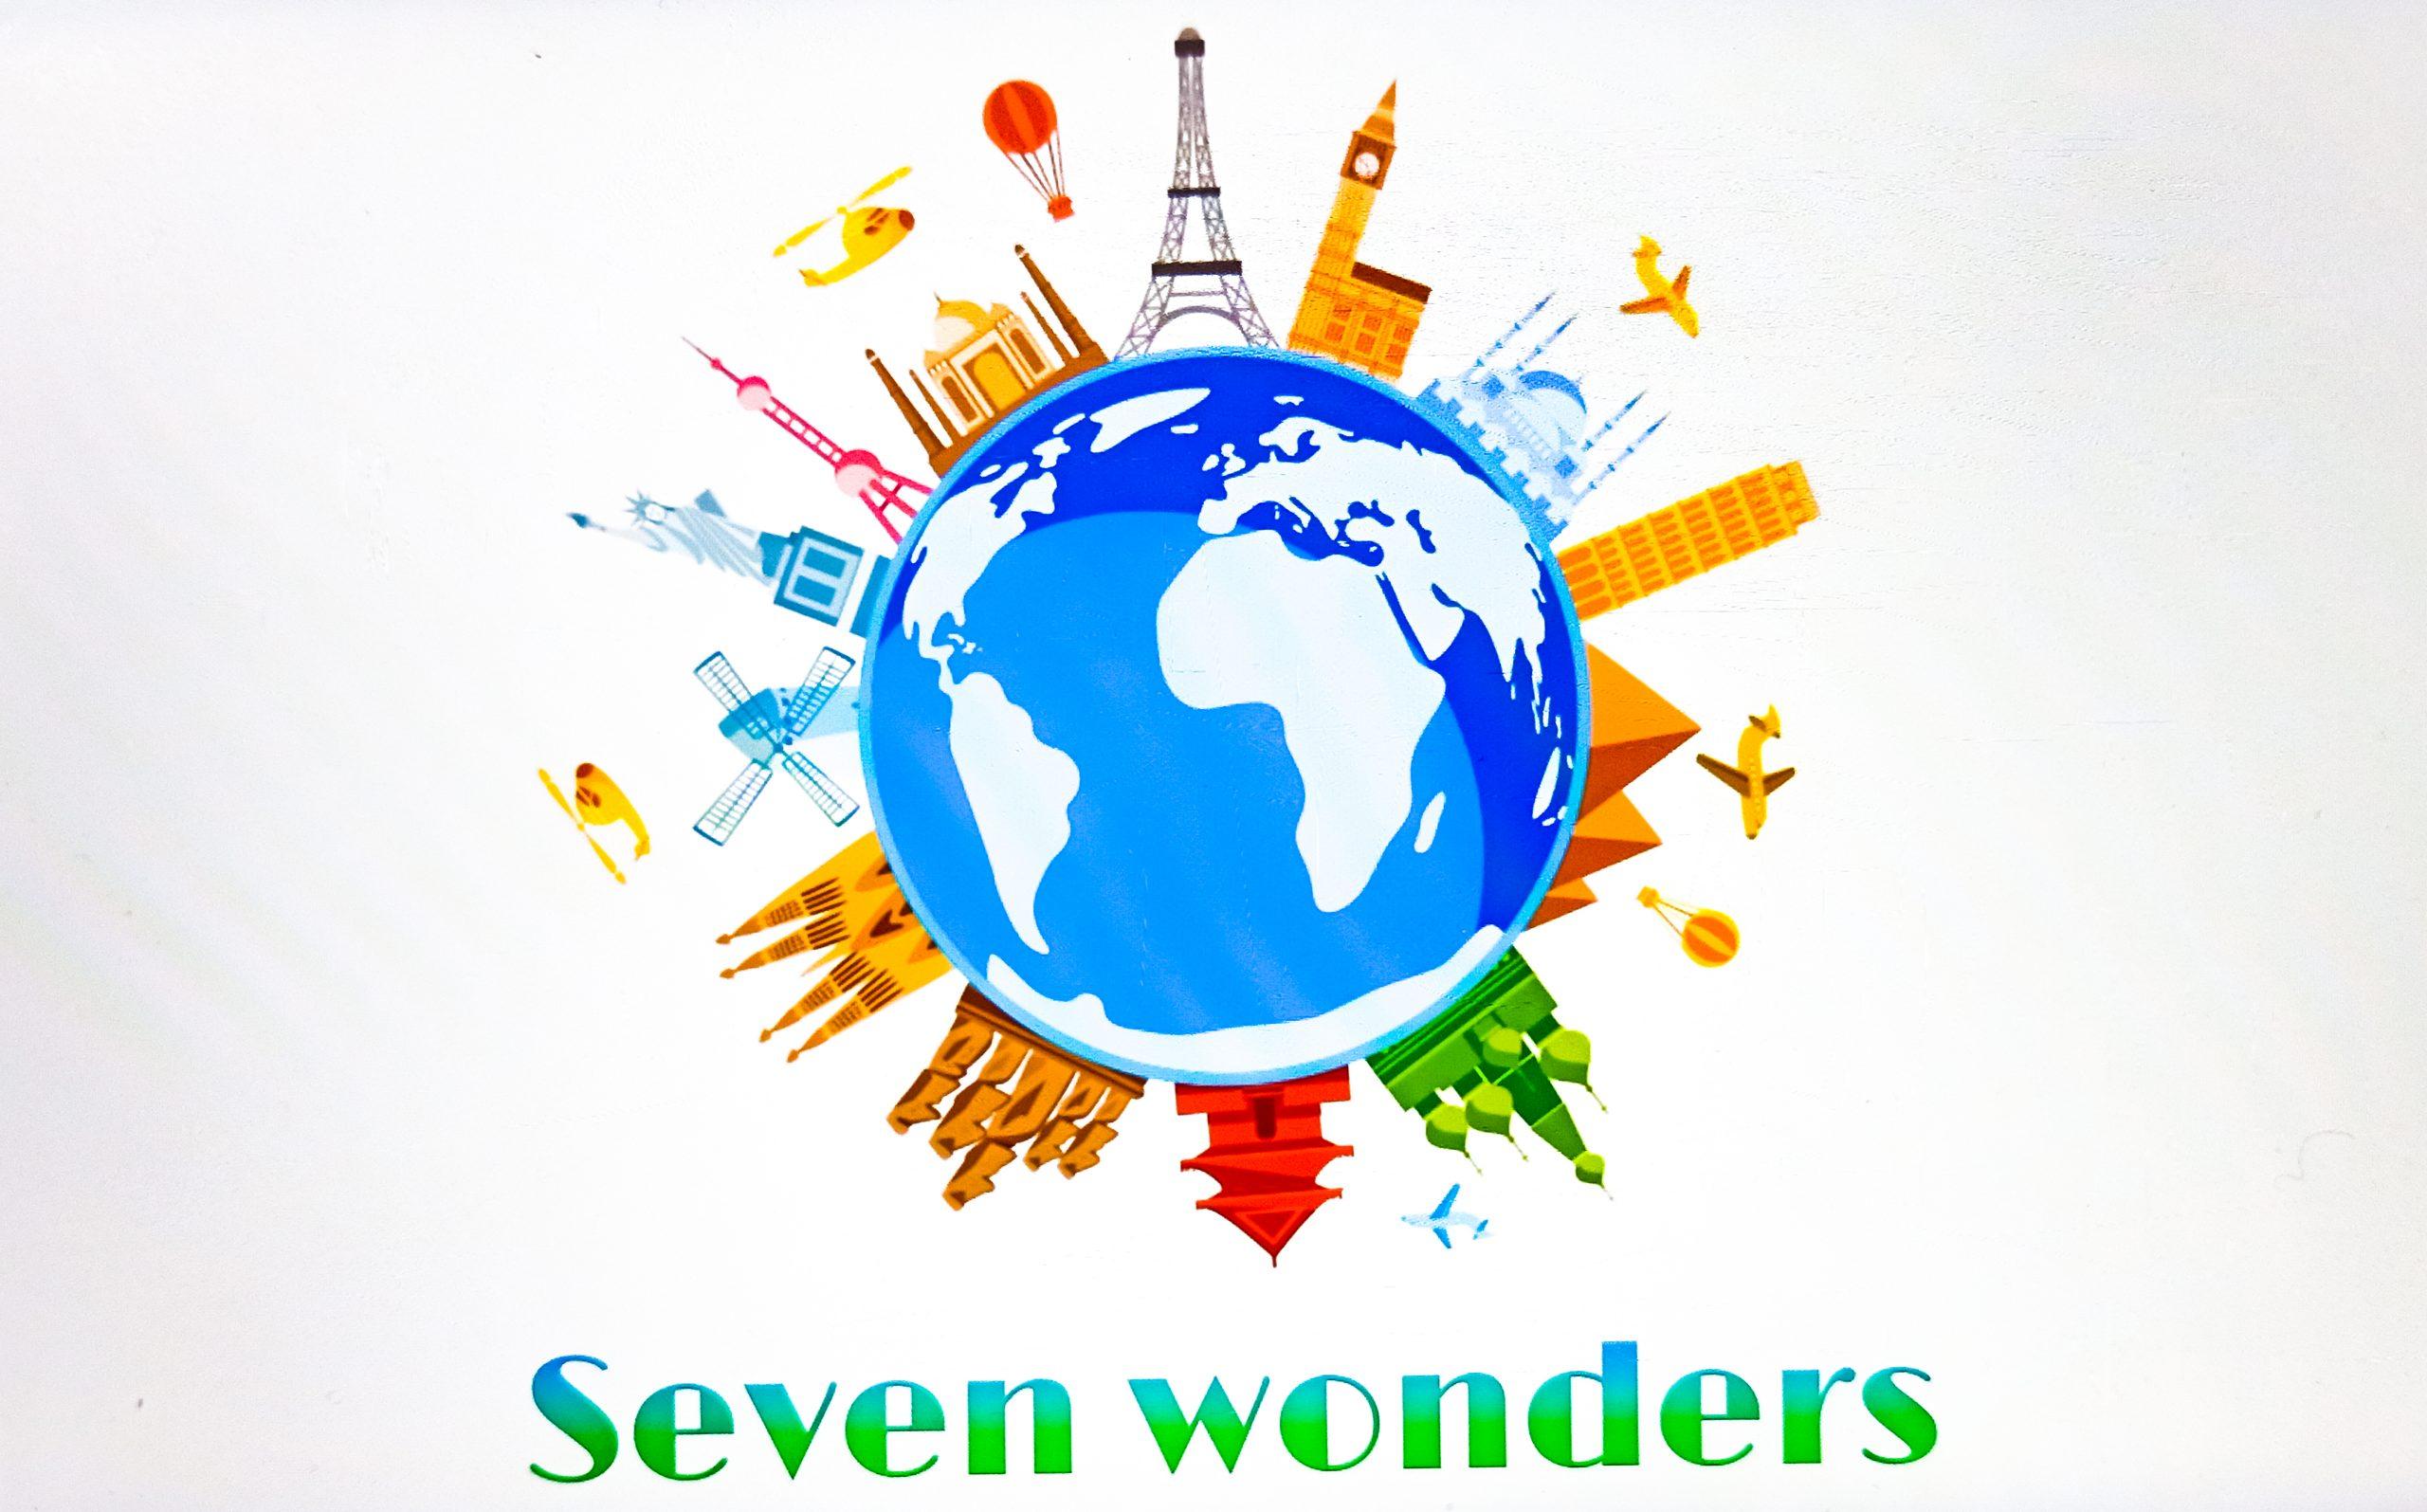 Seven Wonders Illustration